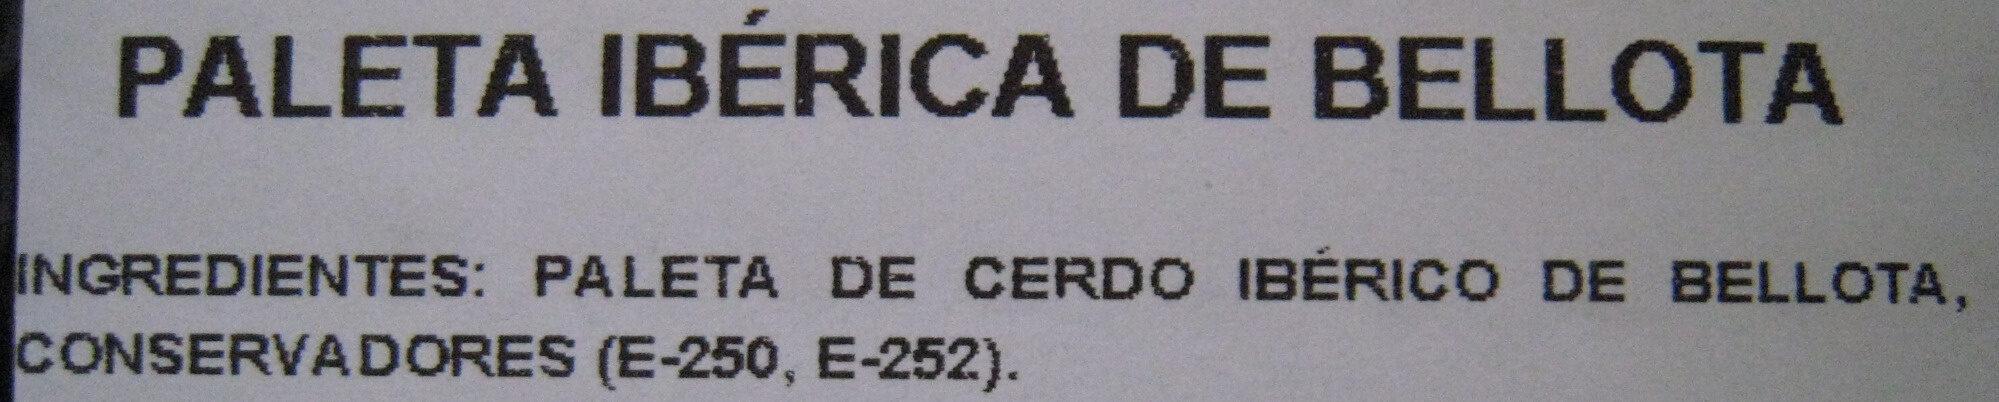 Paleta Ibérica 100 g de Bellota - Ingredients - es